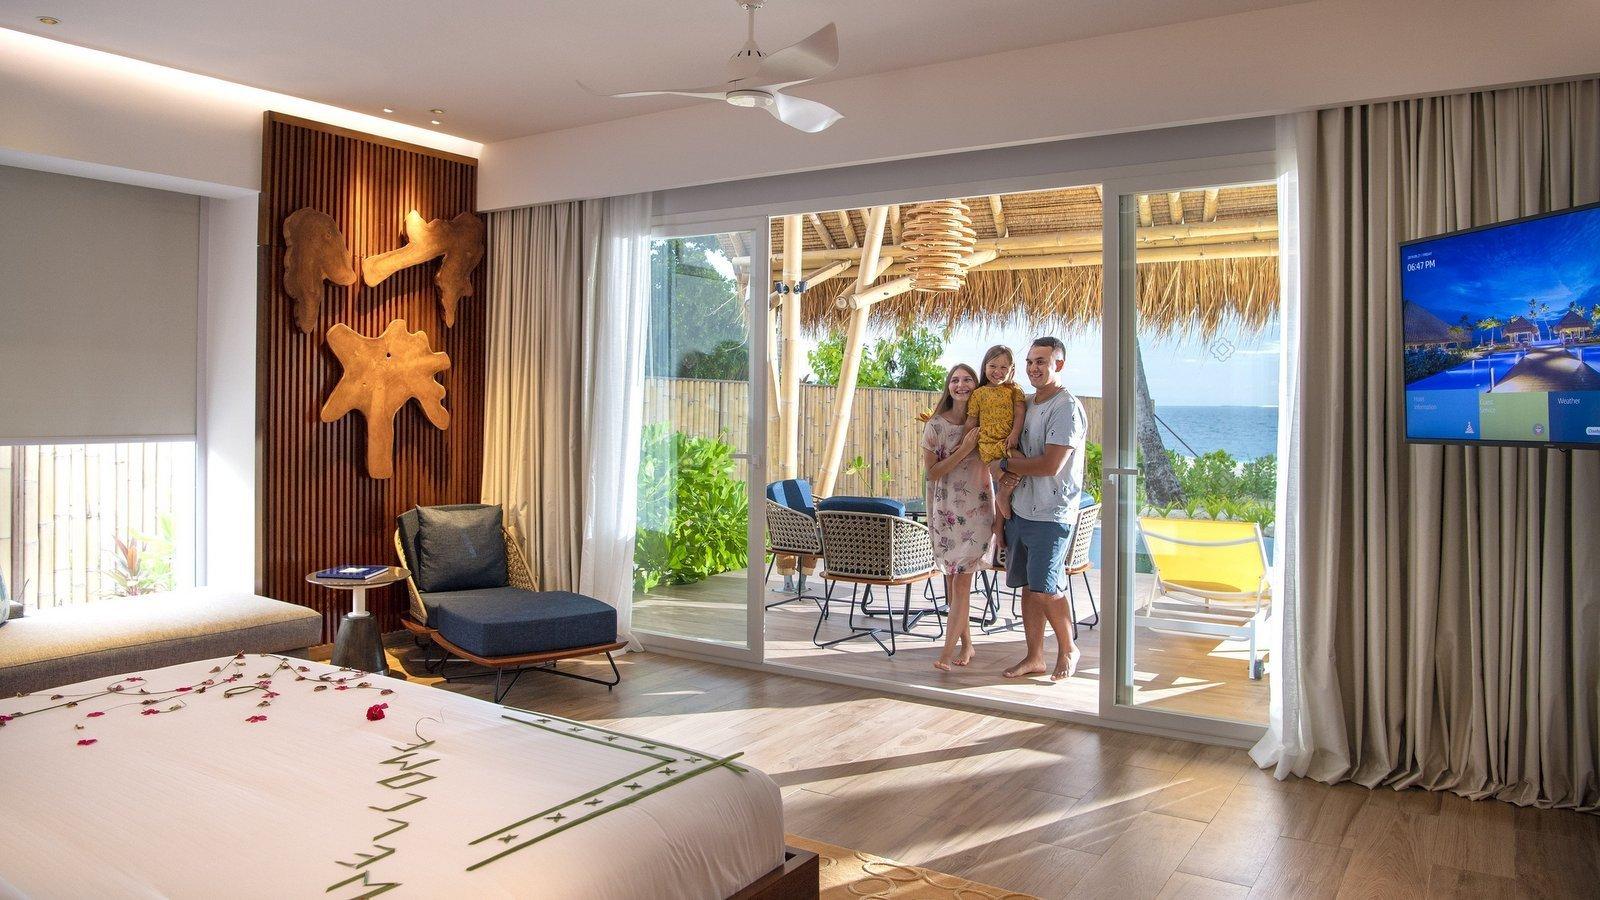 Мальдивы, отель Emerald Maldives Resort & Spa, номер Family Beach Villa with Pool